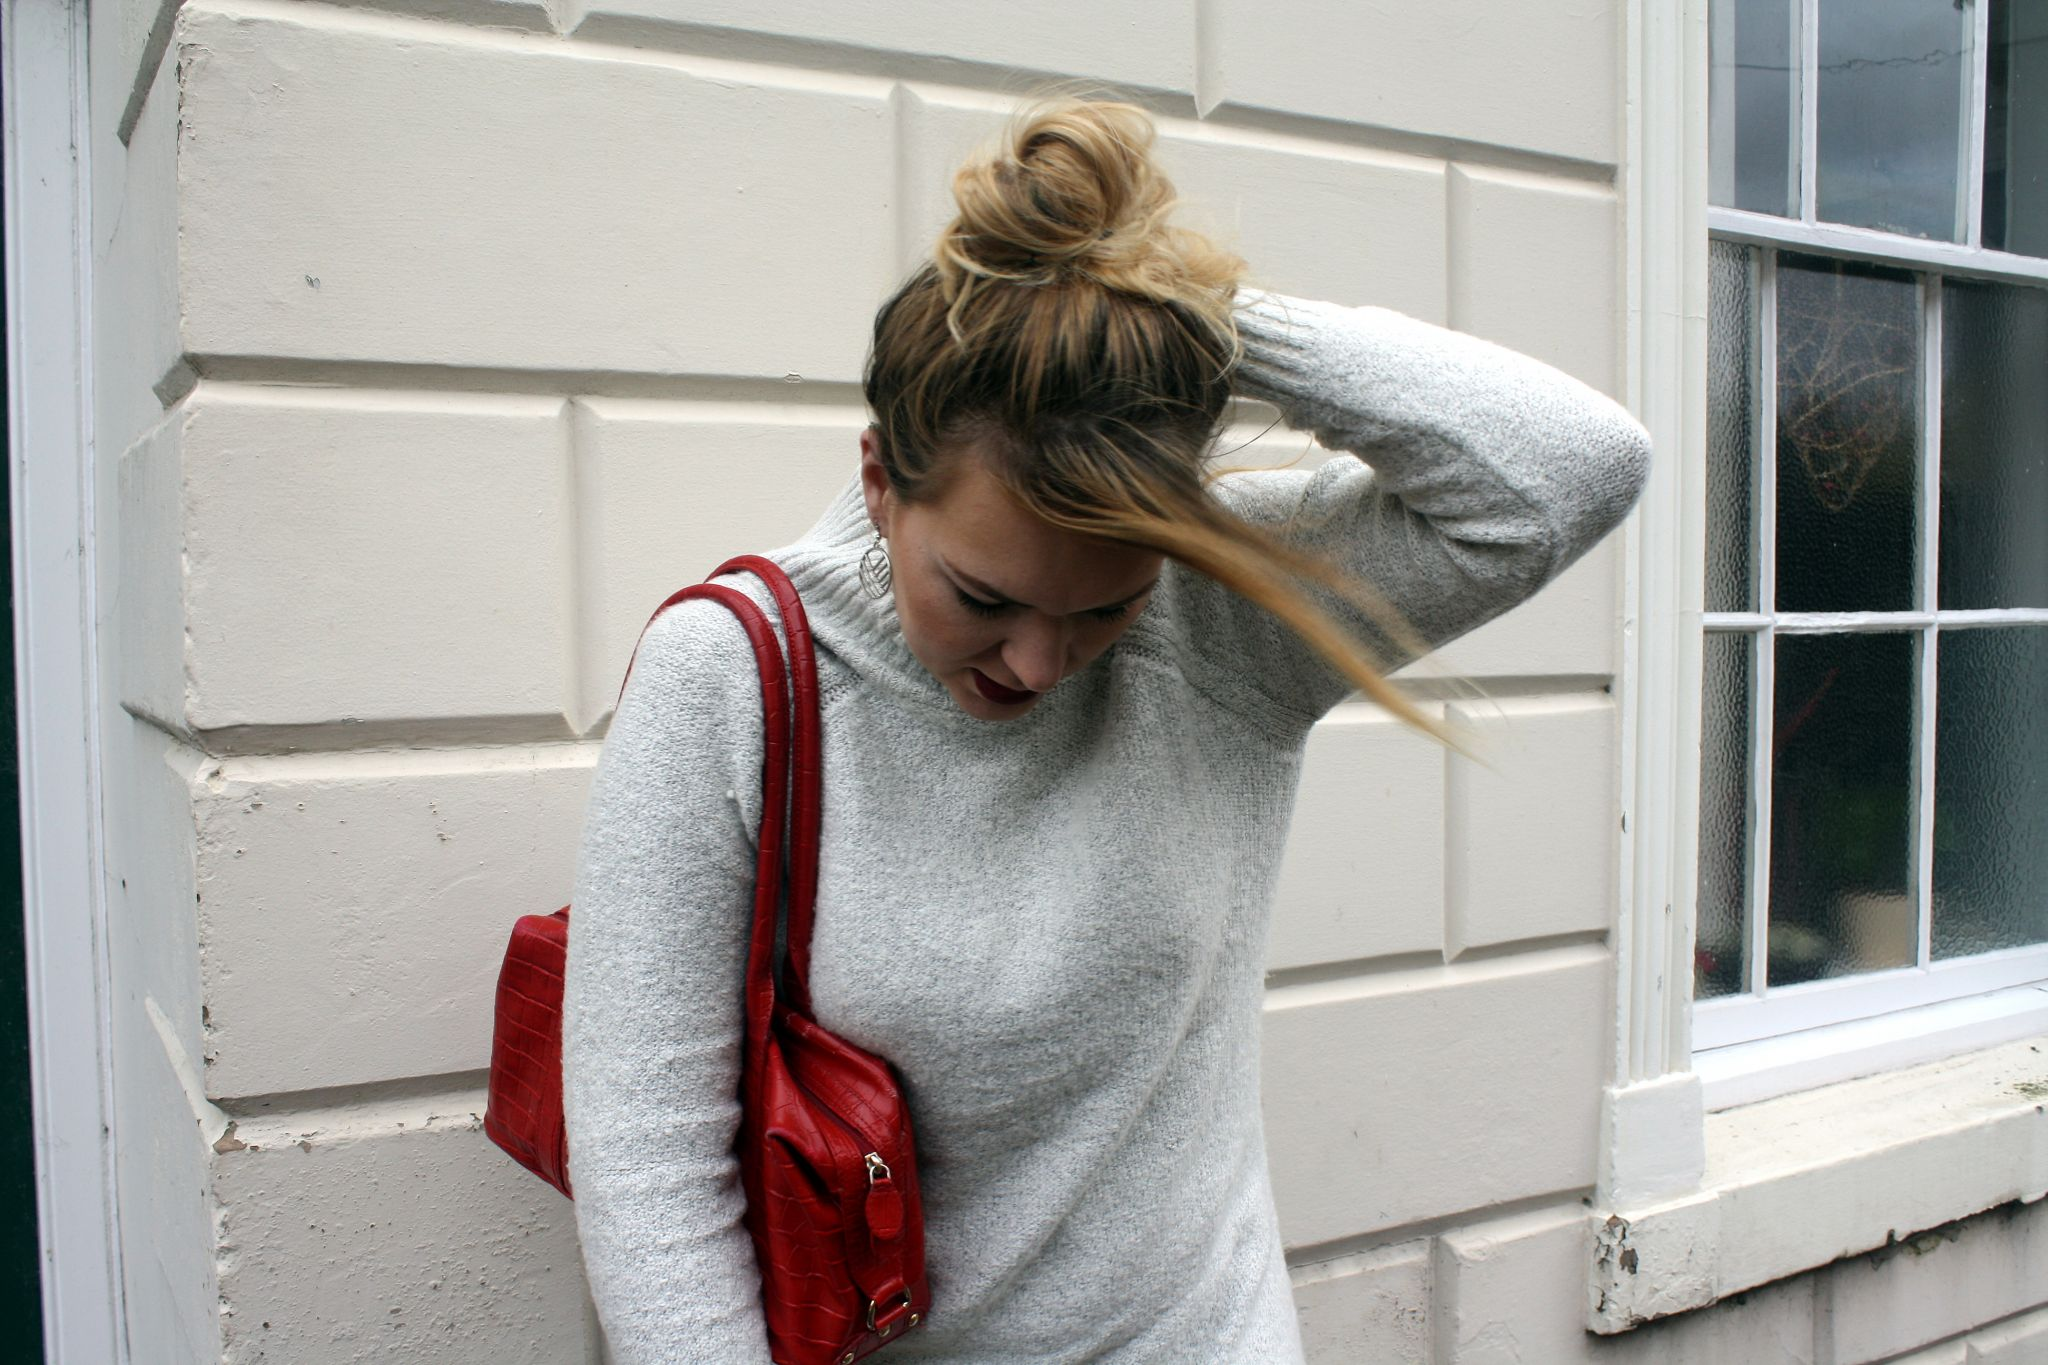 warm, Violet Glenton, H&m, Knitwear